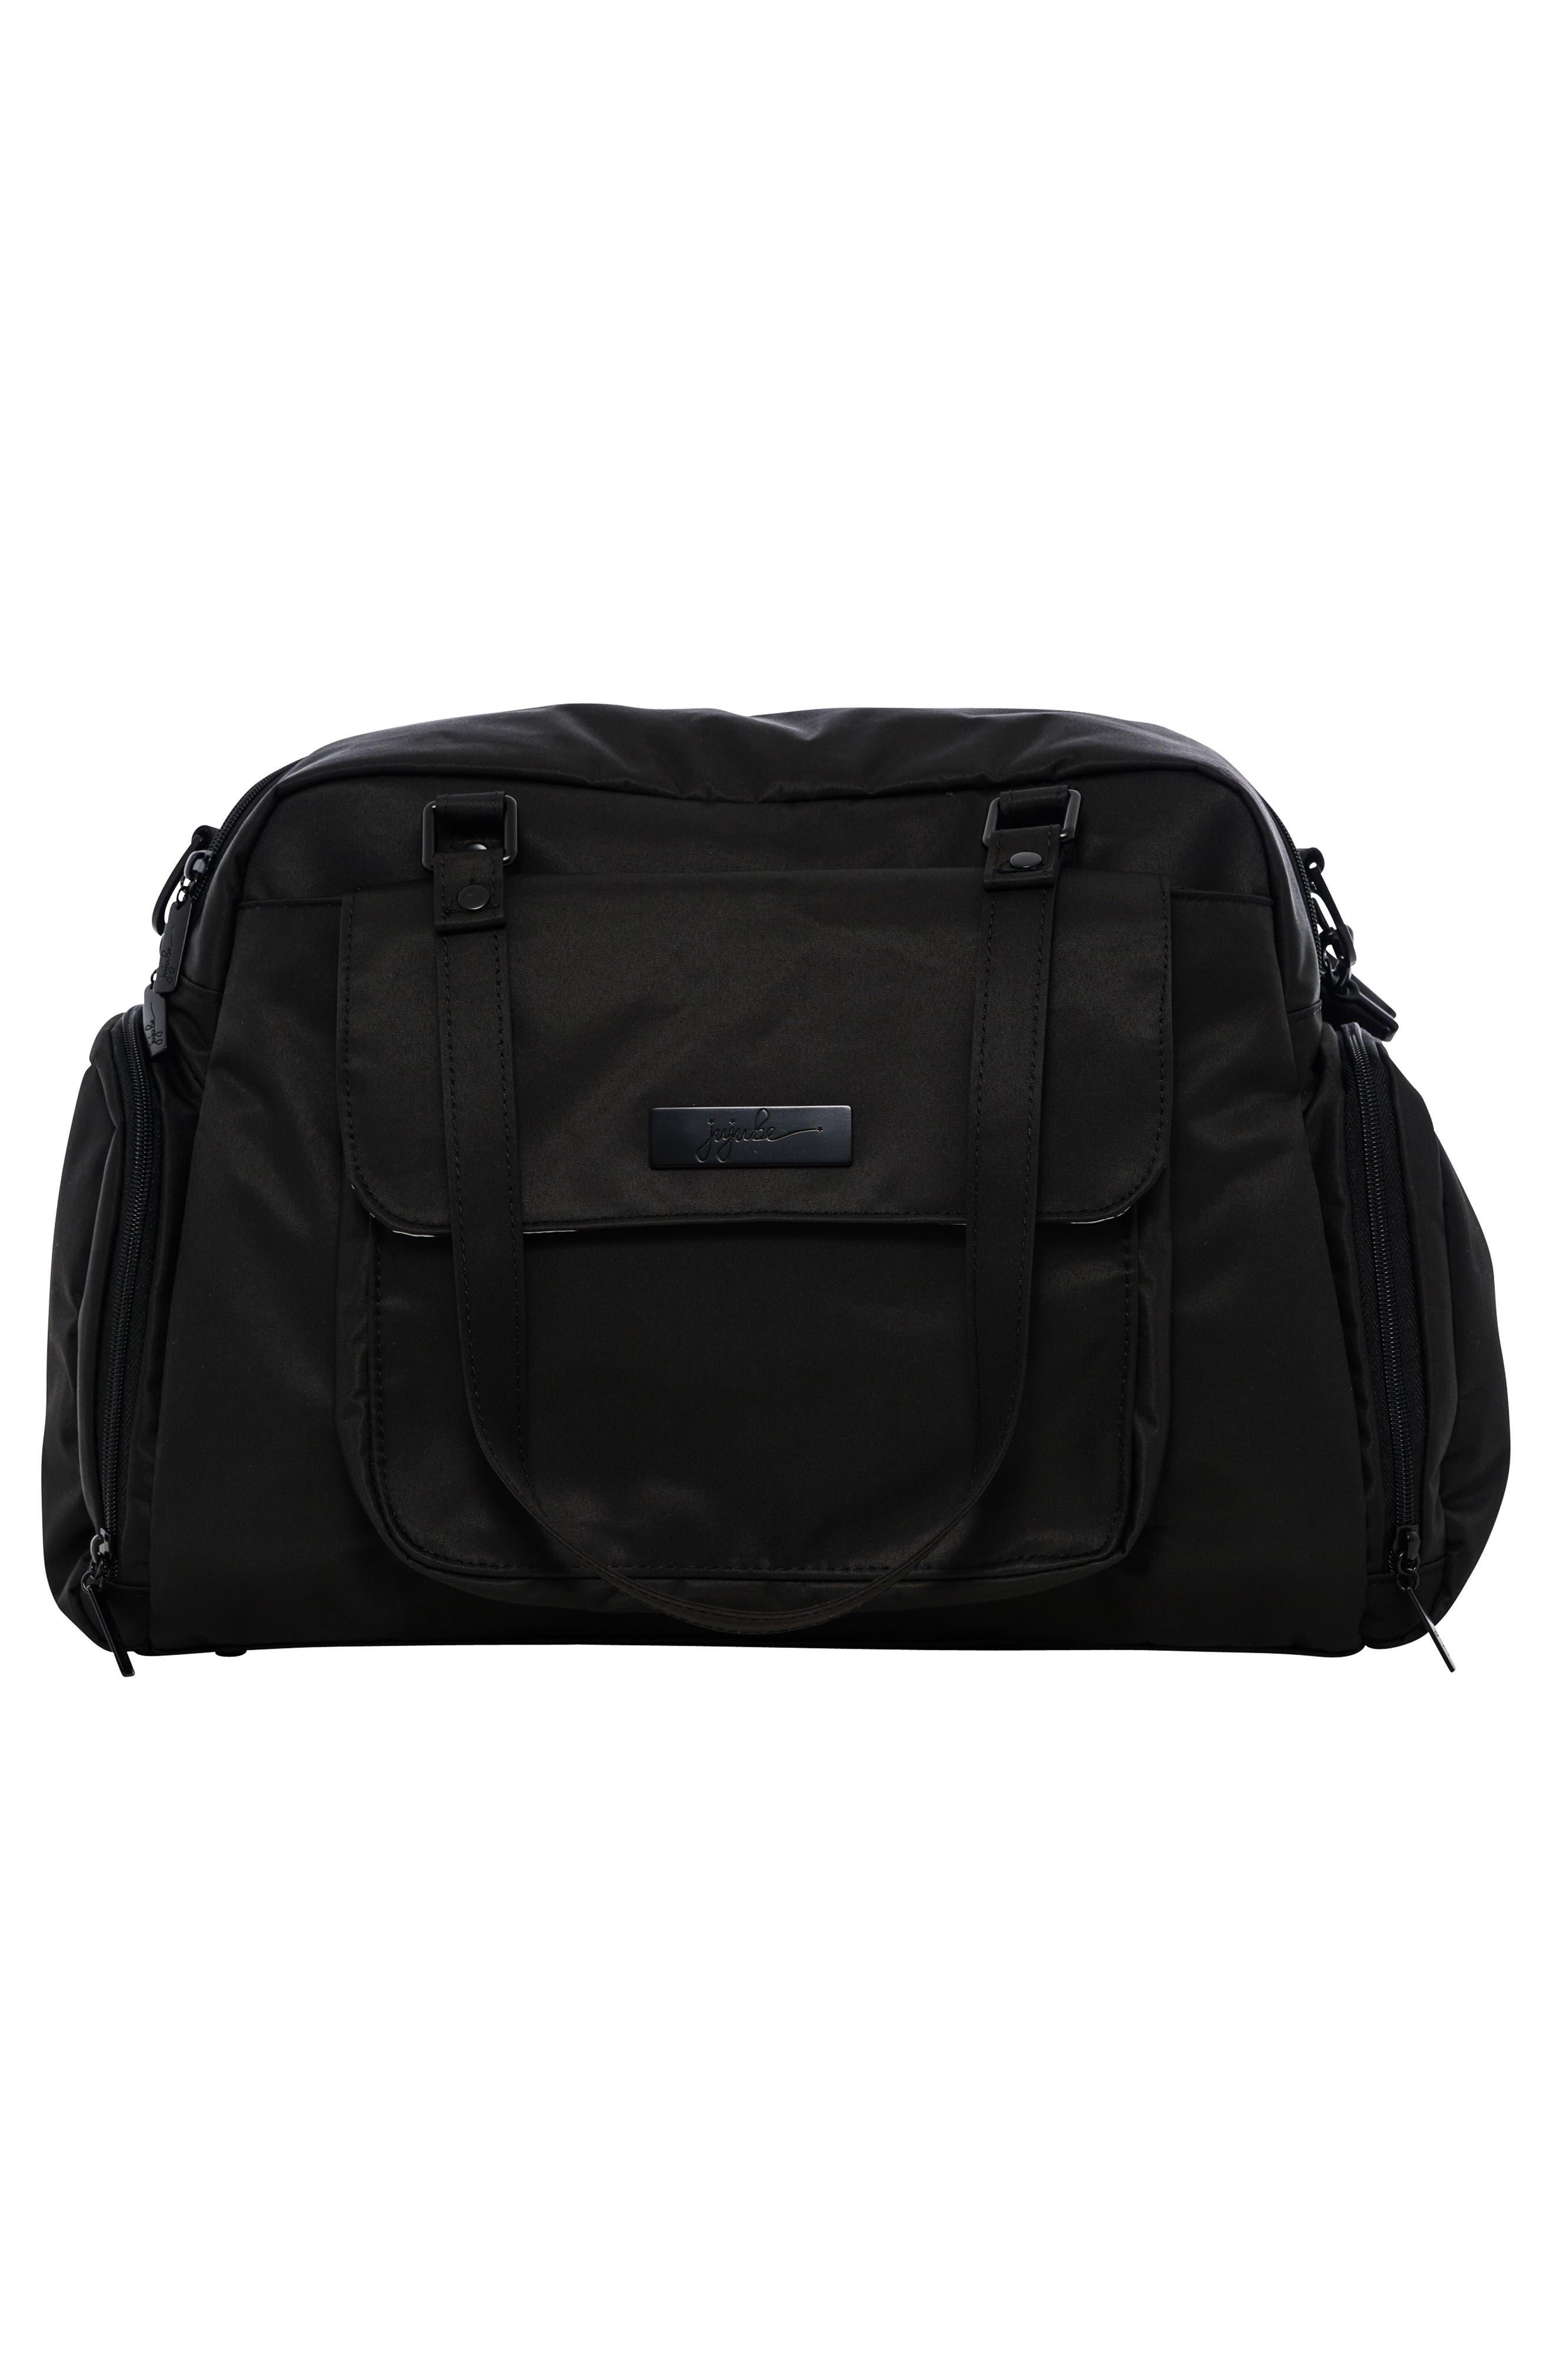 Onyx Be Pumped Bag,                             Alternate thumbnail 7, color,                             001